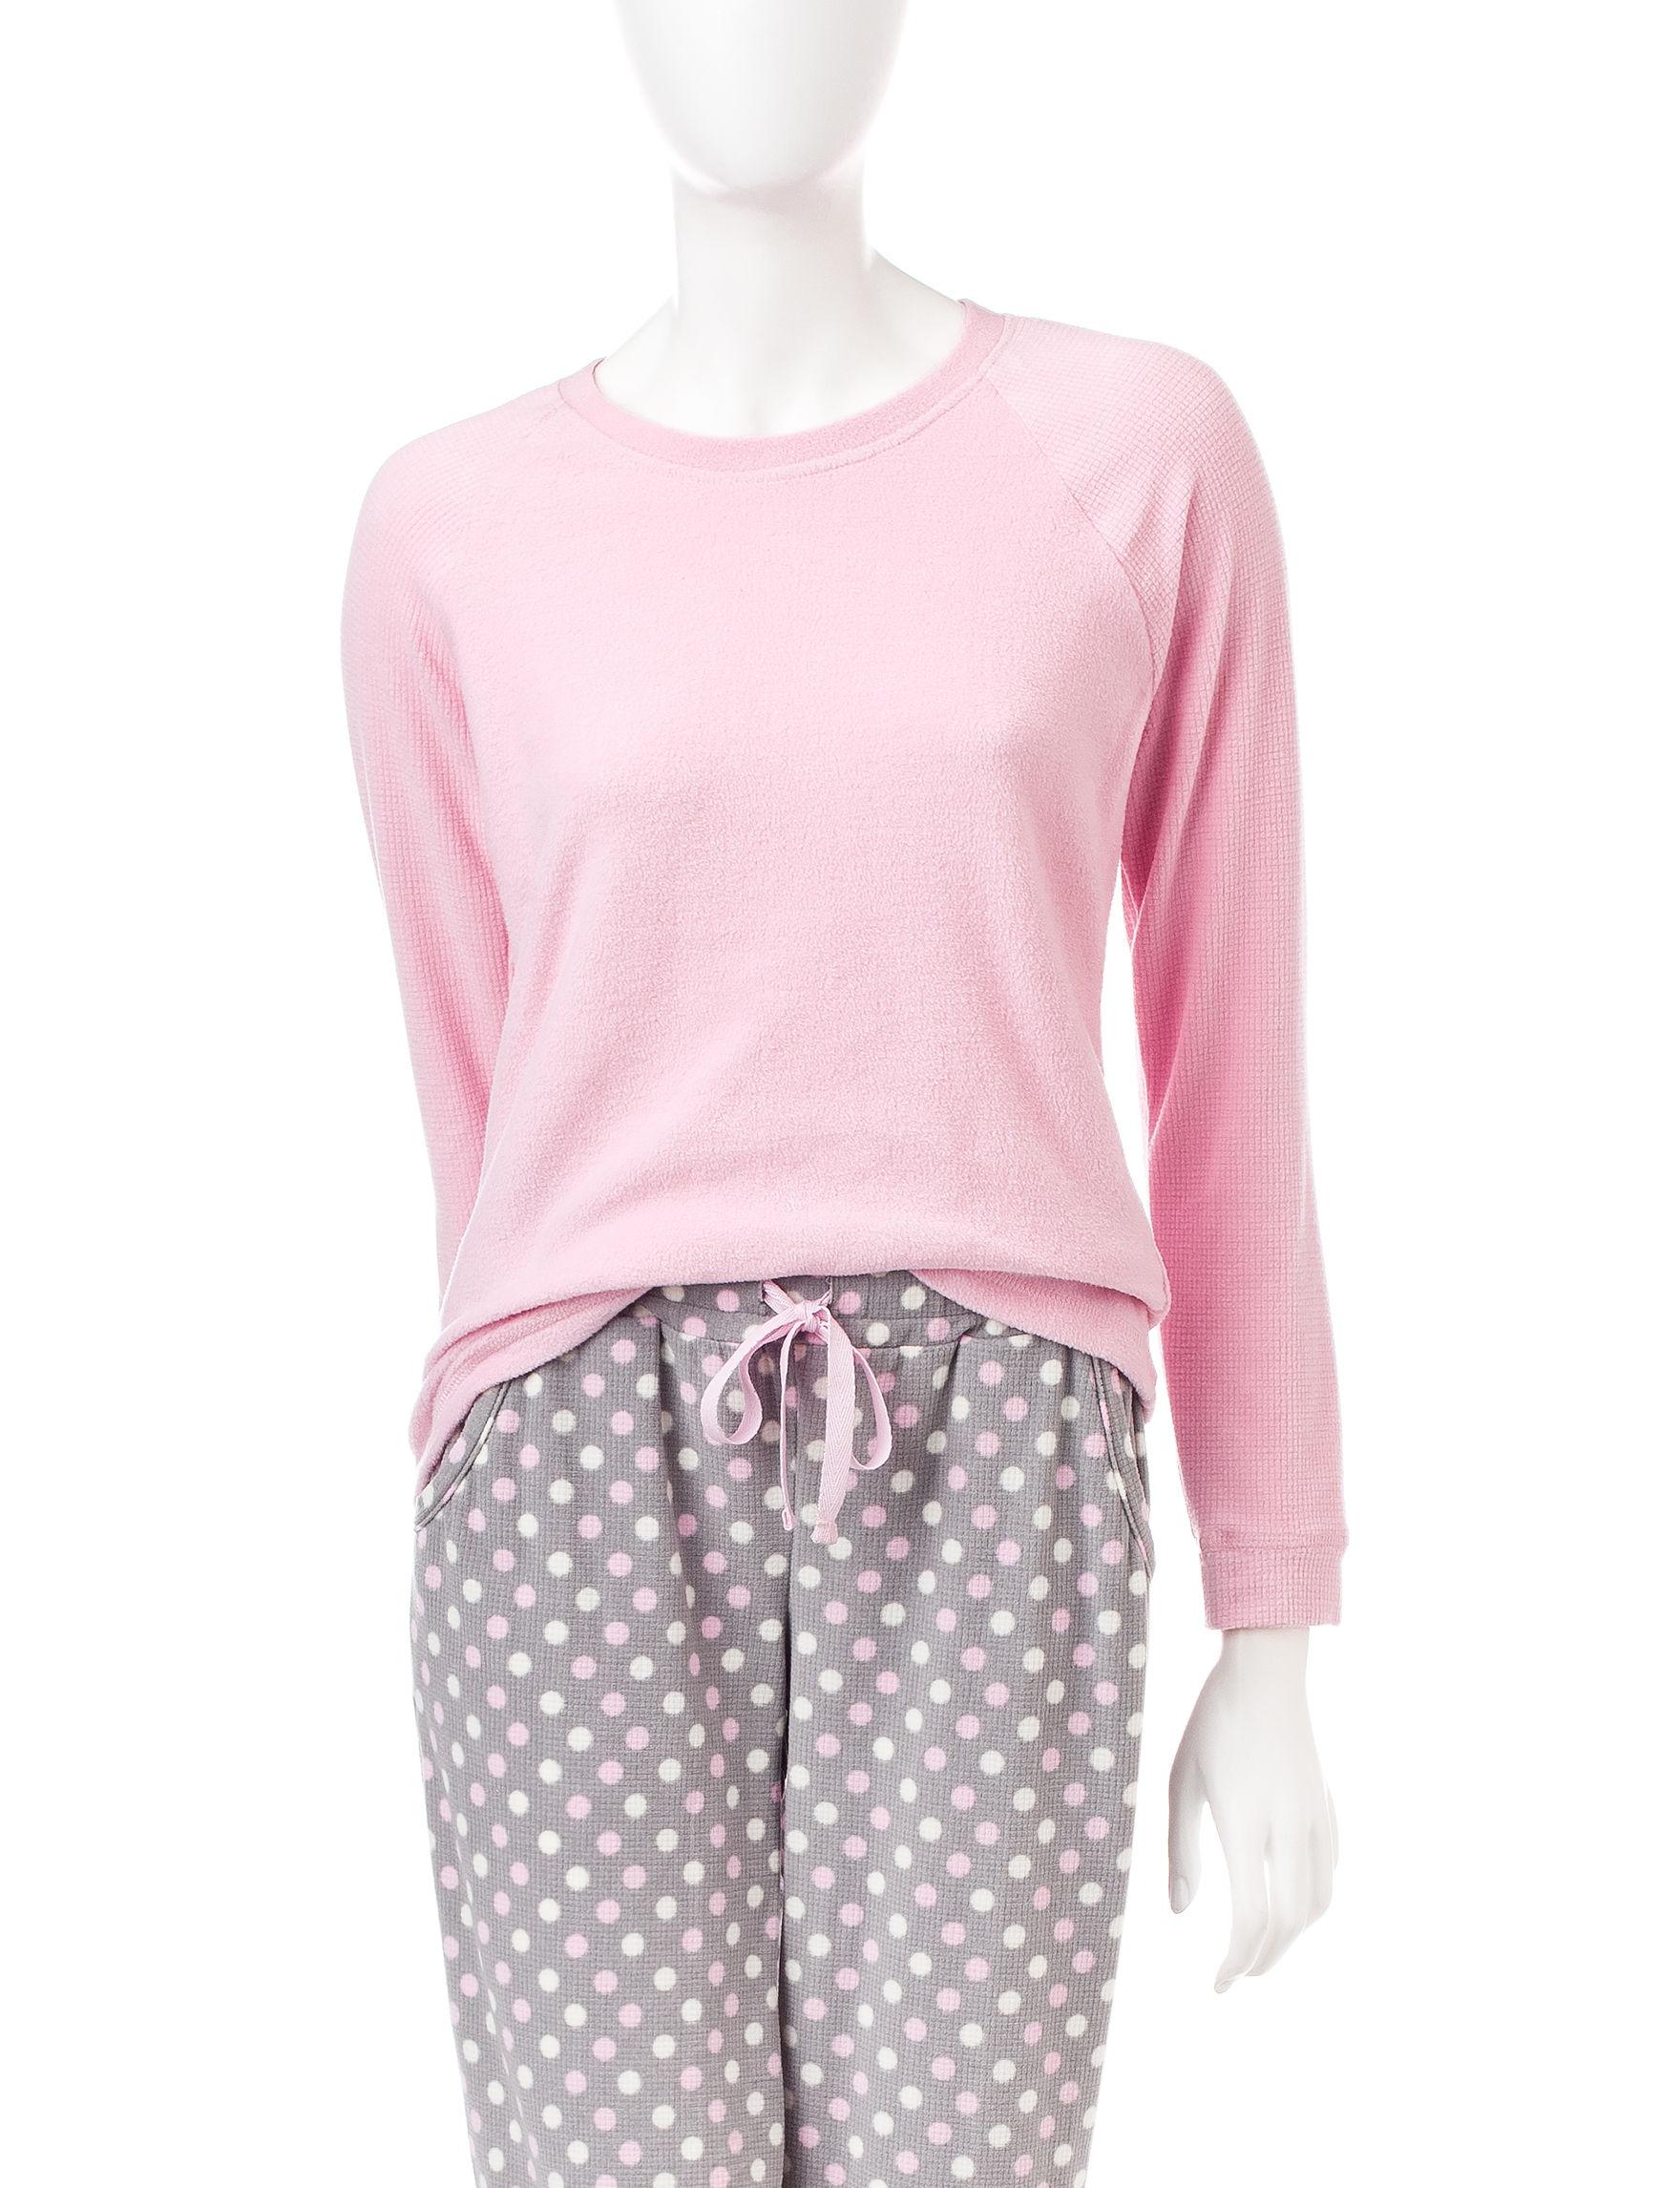 Goodnight Kiss Dark Pink Pajama Tops